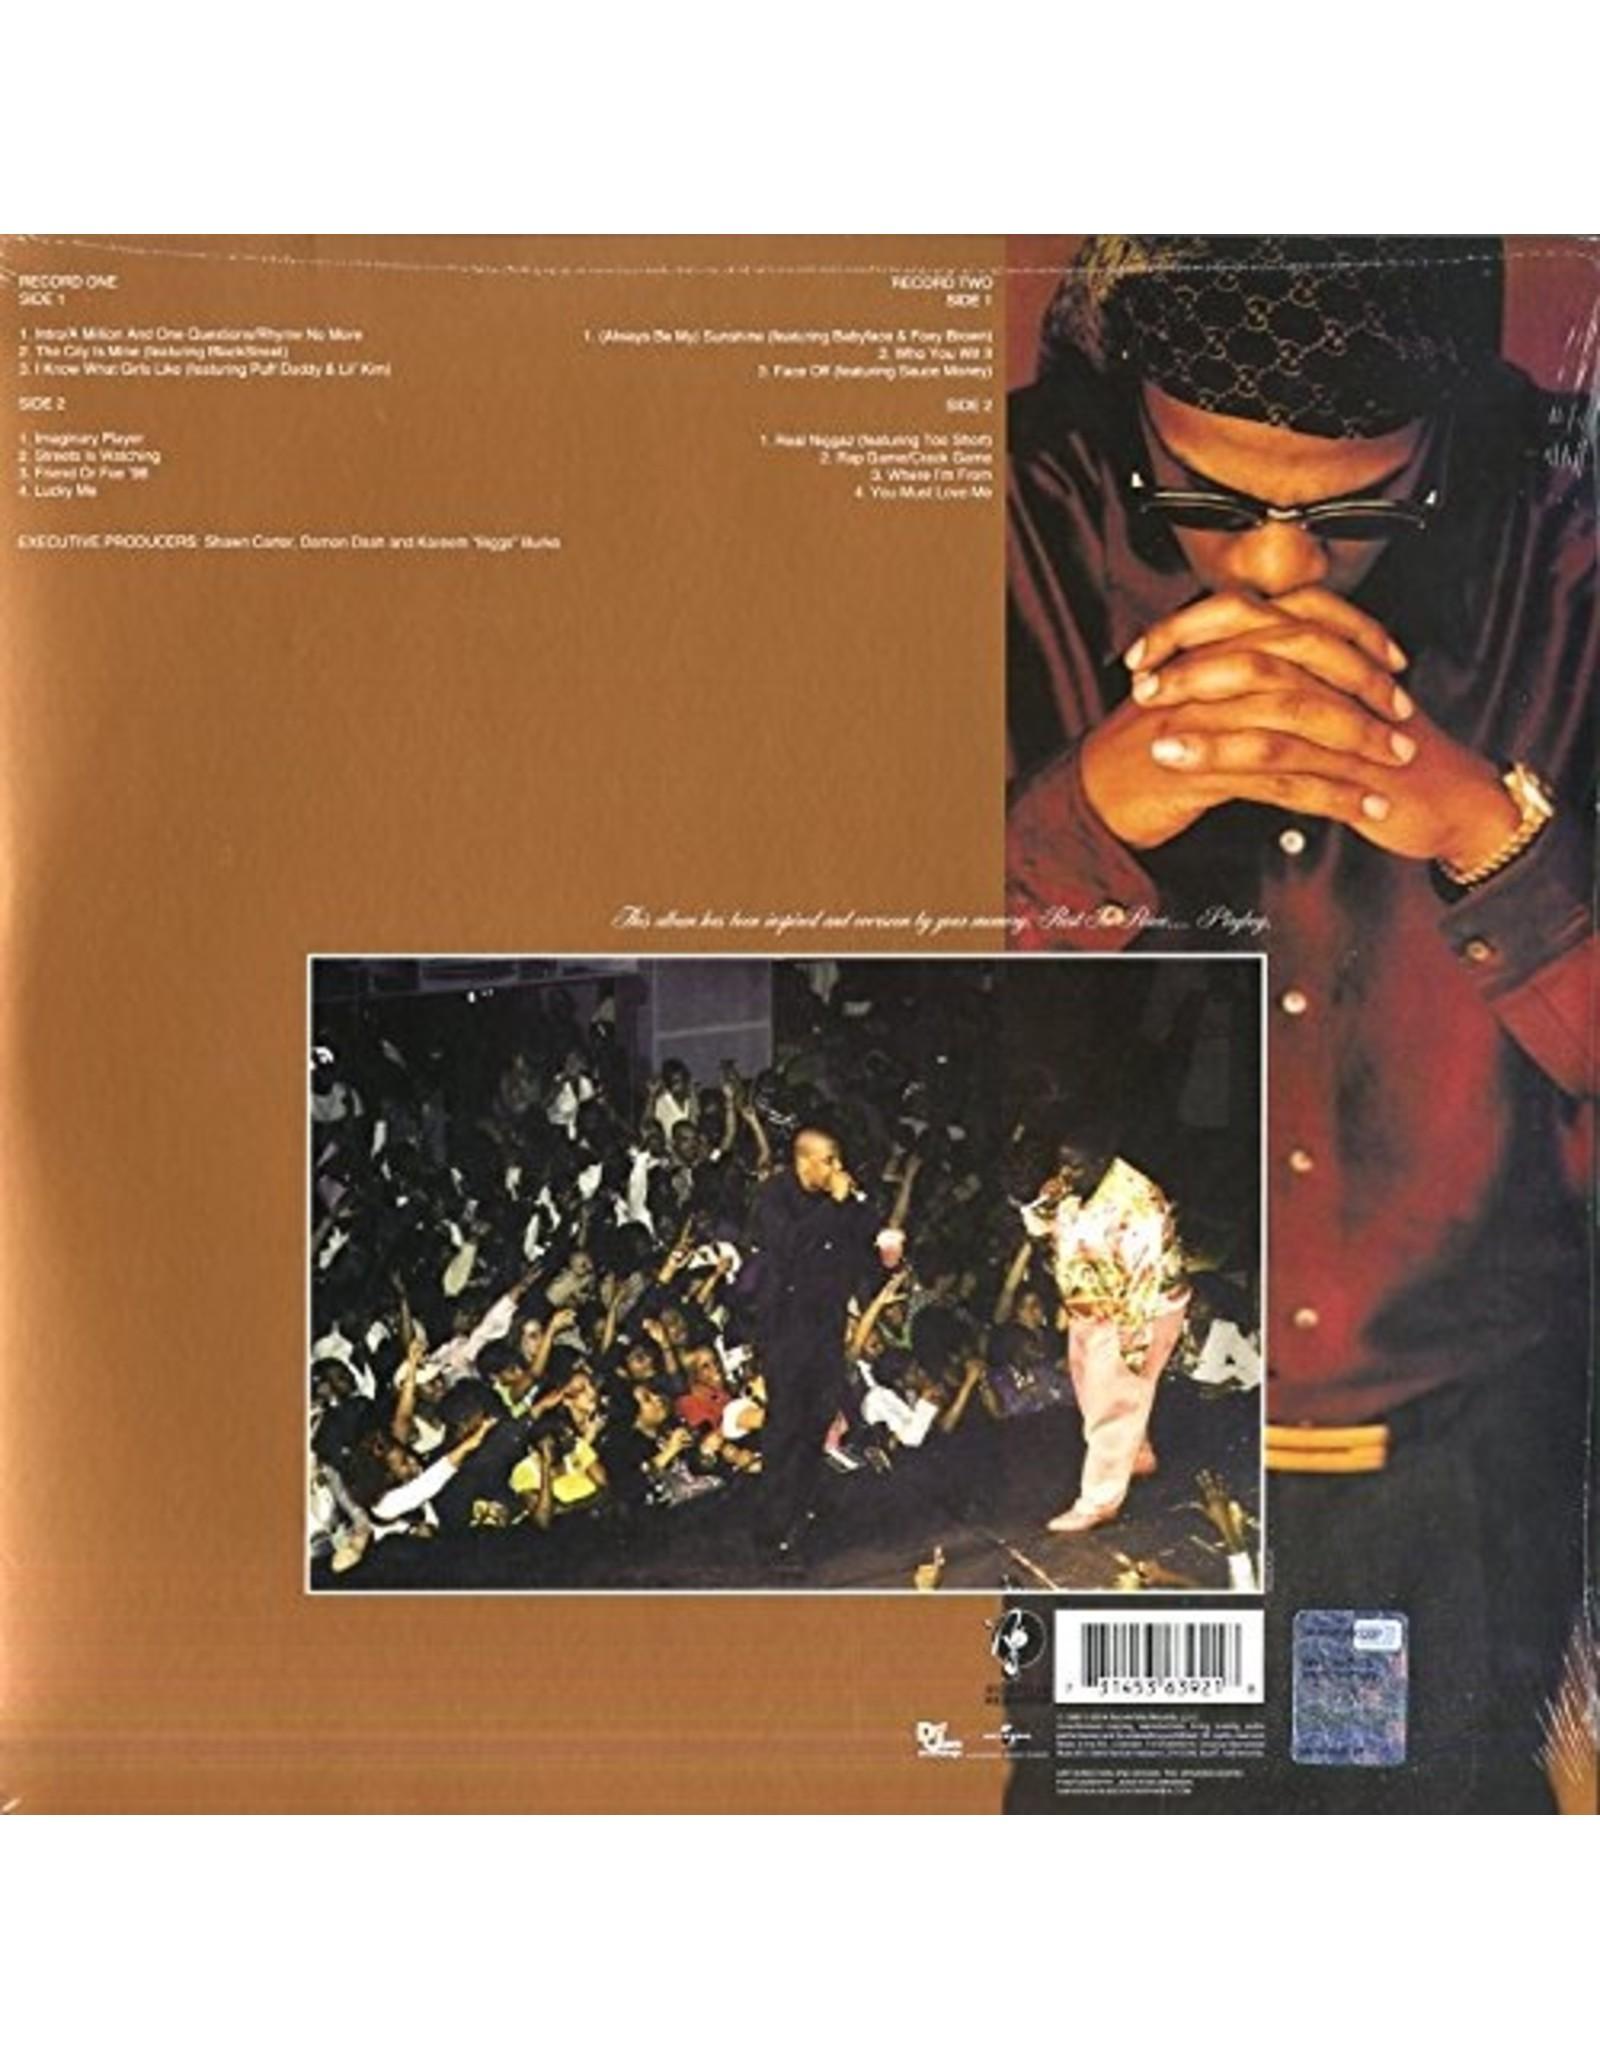 Jay-Z - Vol. 1: In My Lifetime